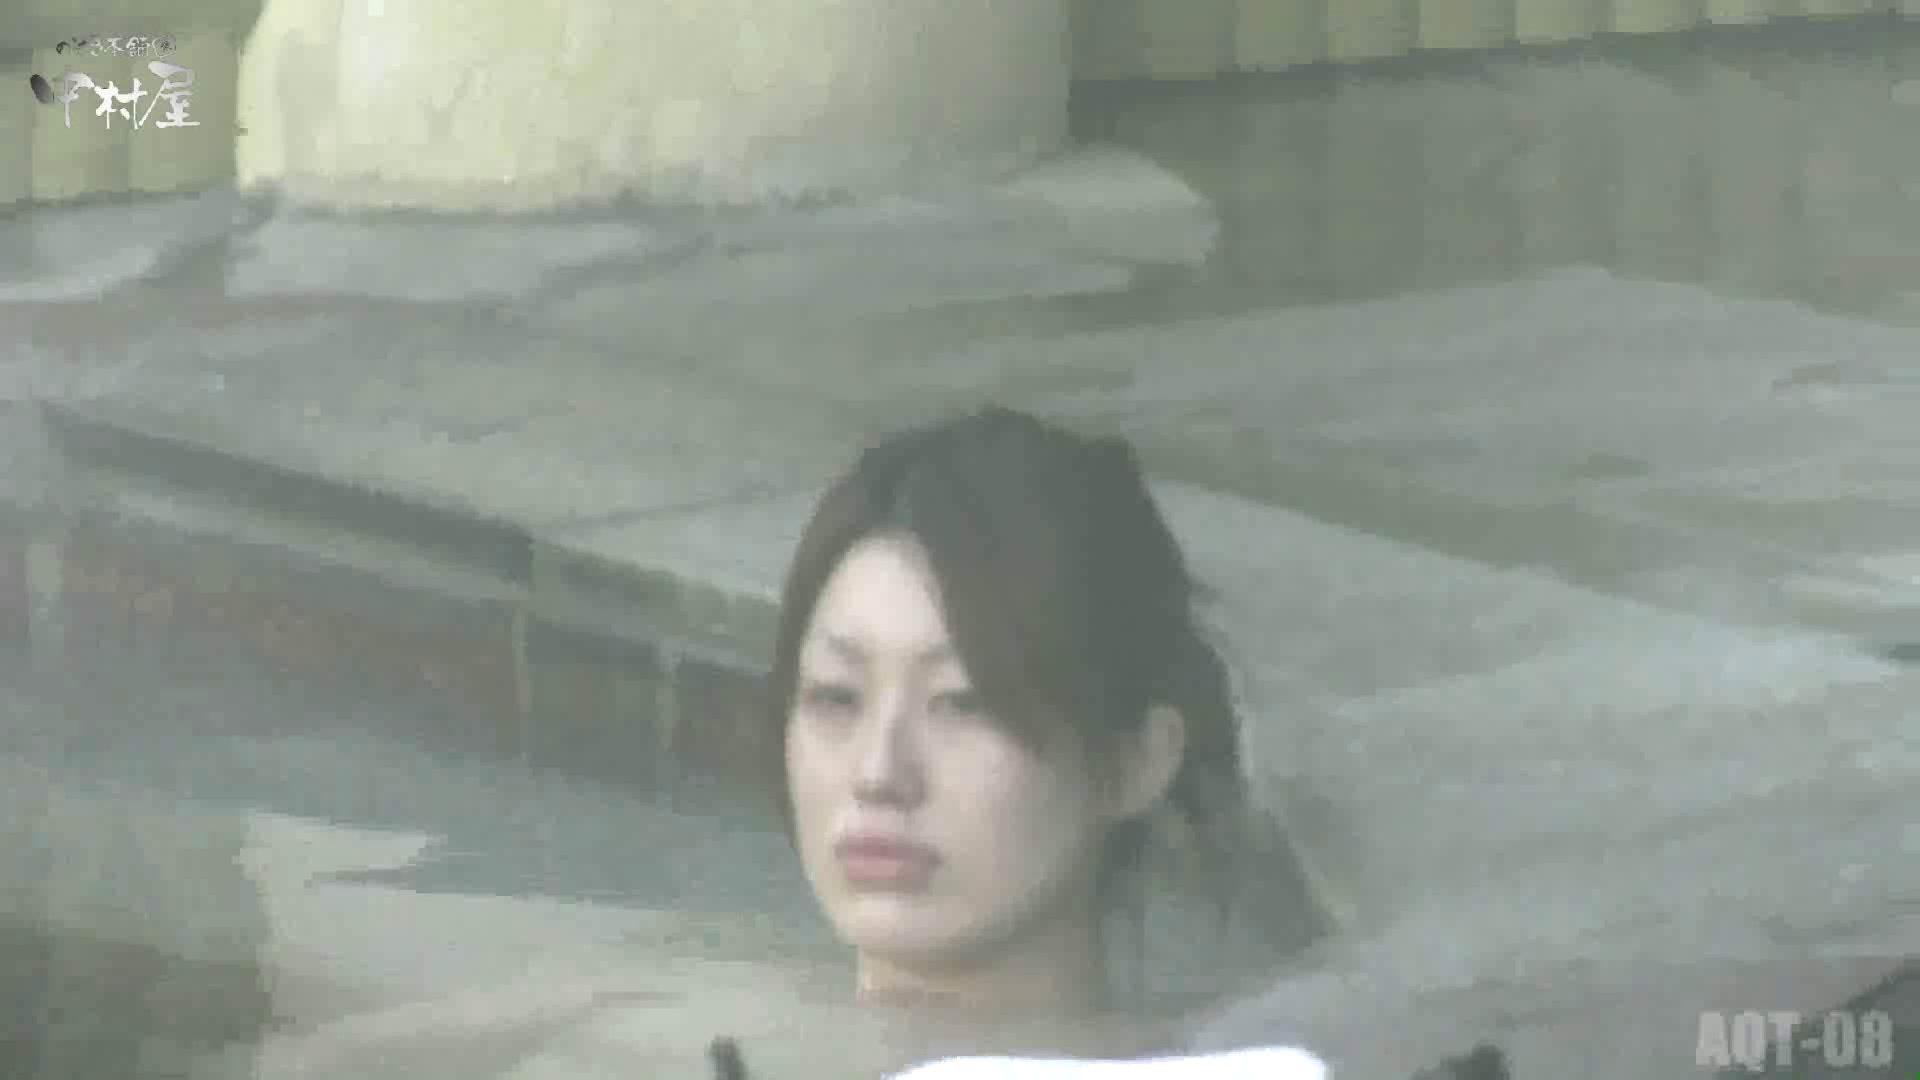 Aquaな露天風呂Vol.872潜入盗撮露天風呂八判湯 其の三 盗撮 | 潜入  53枚 41